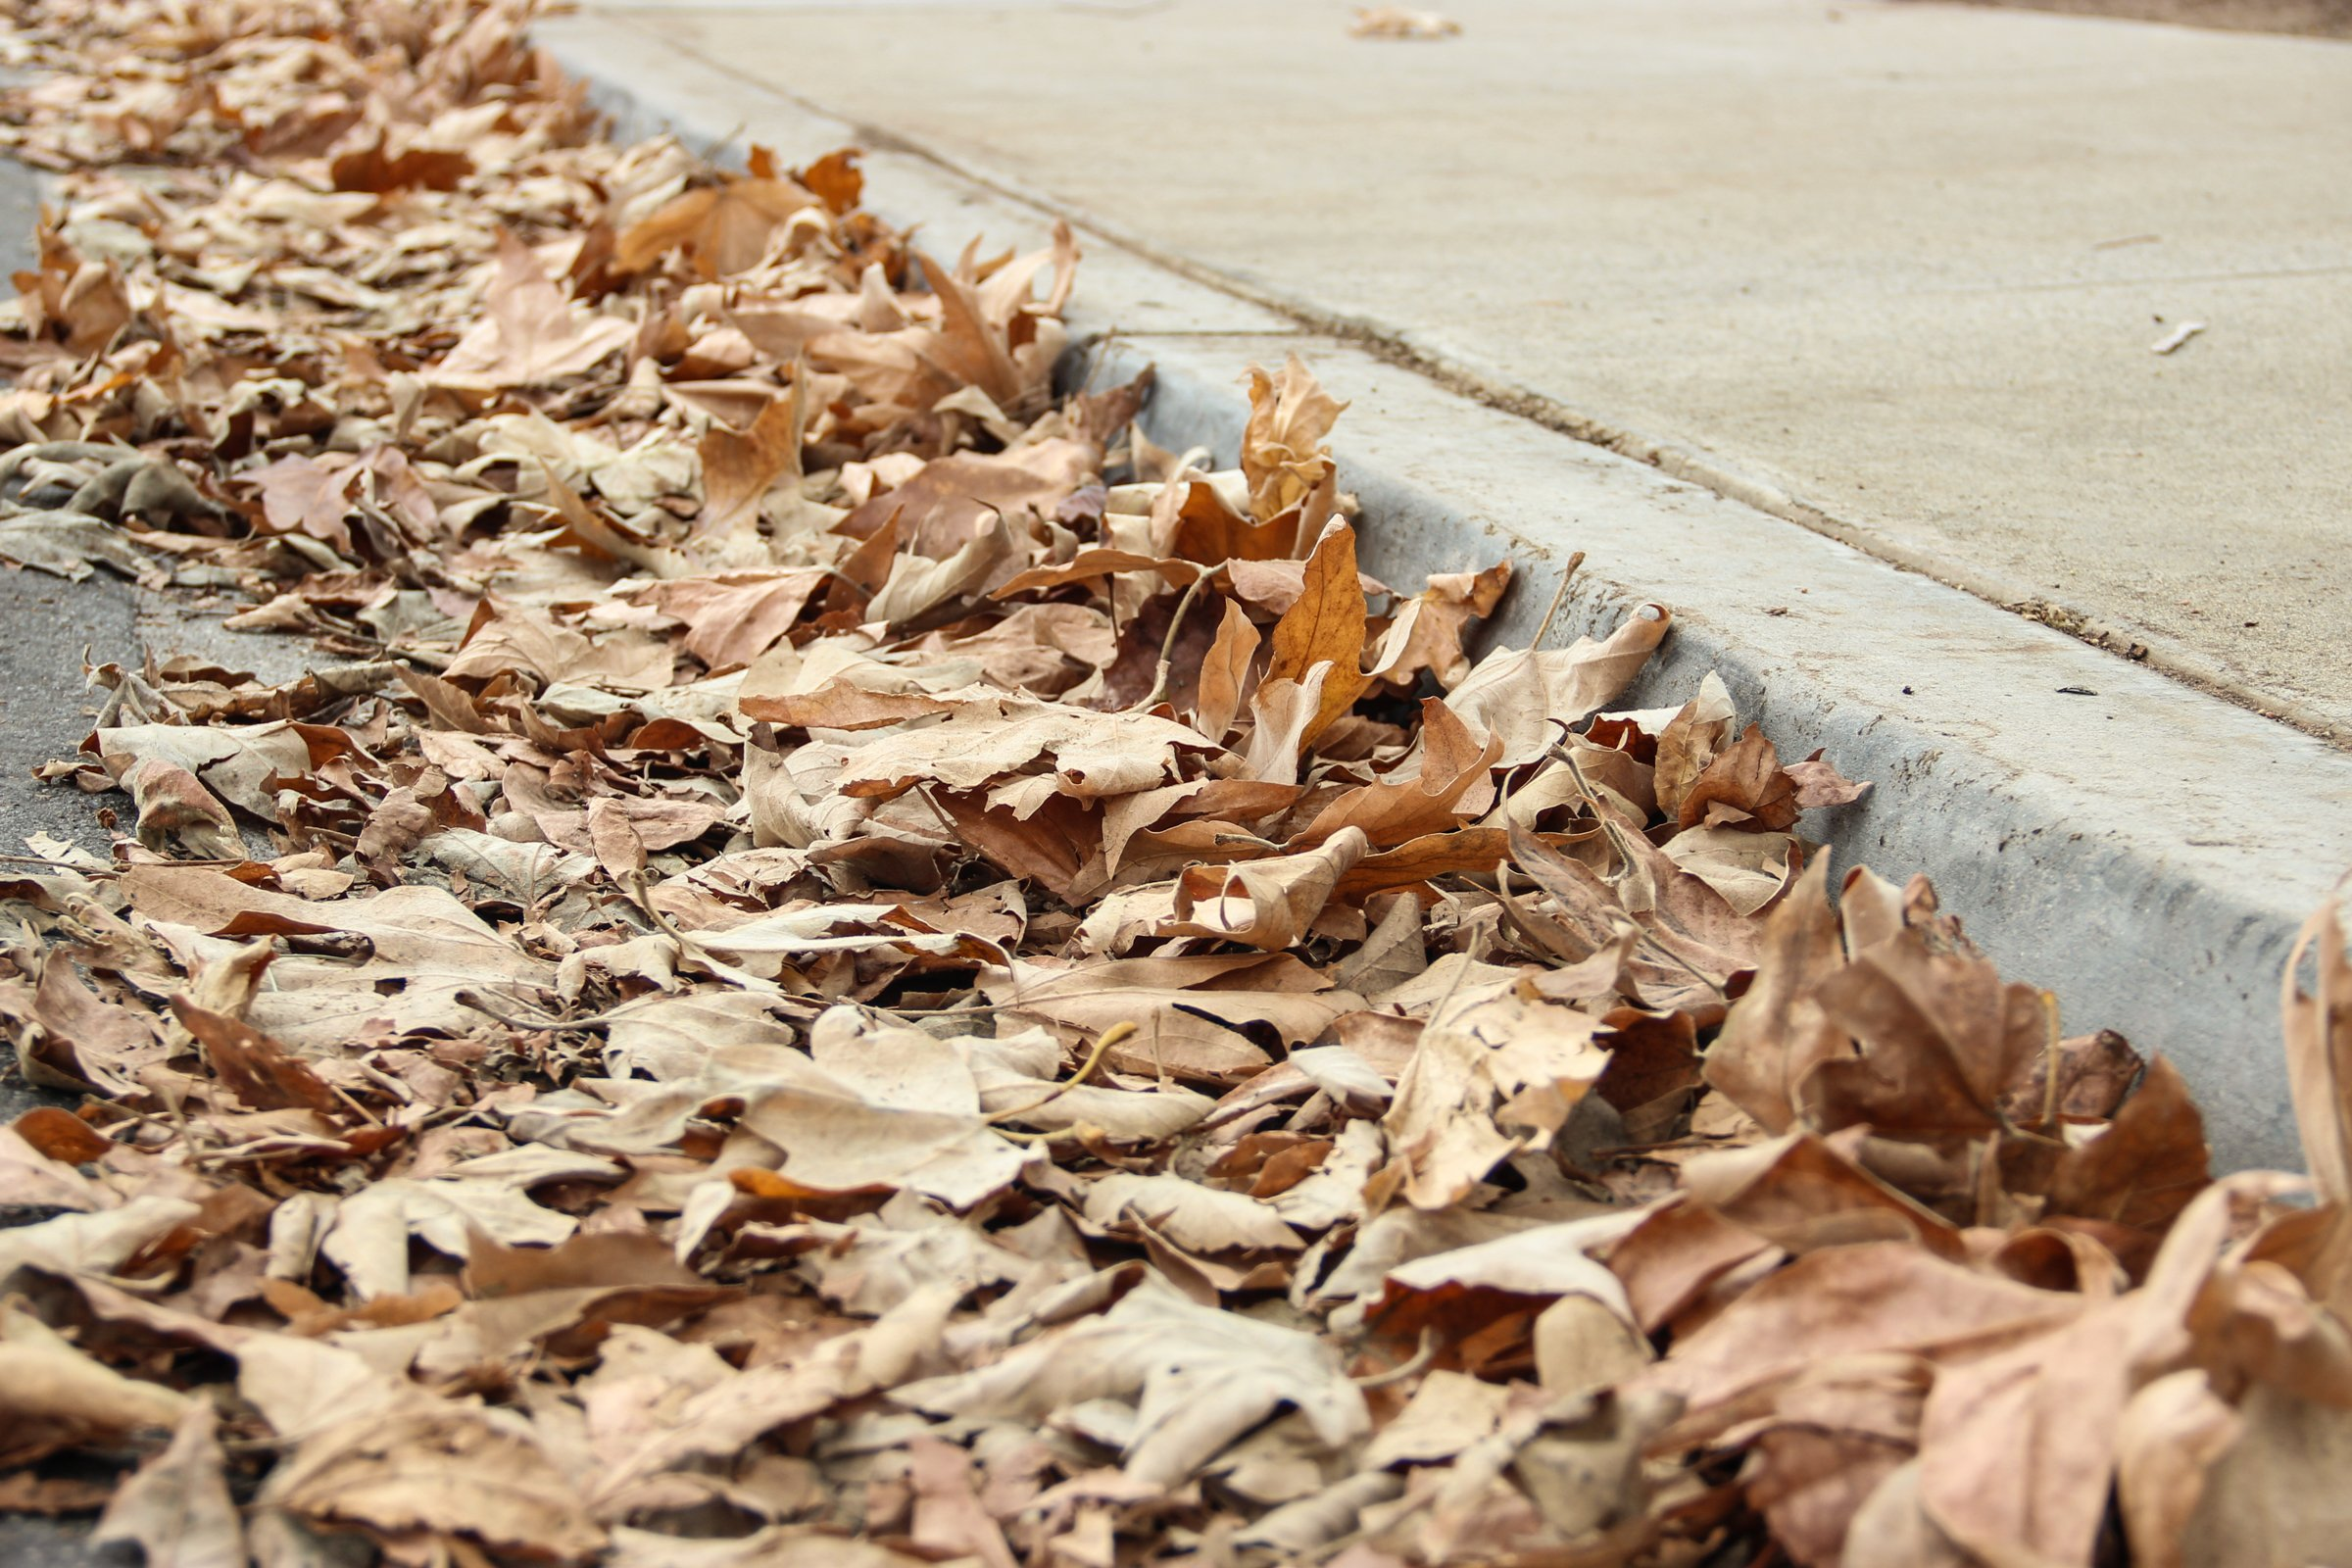 Dead Dry Autumn Leaves Near Sidewalk Pavement